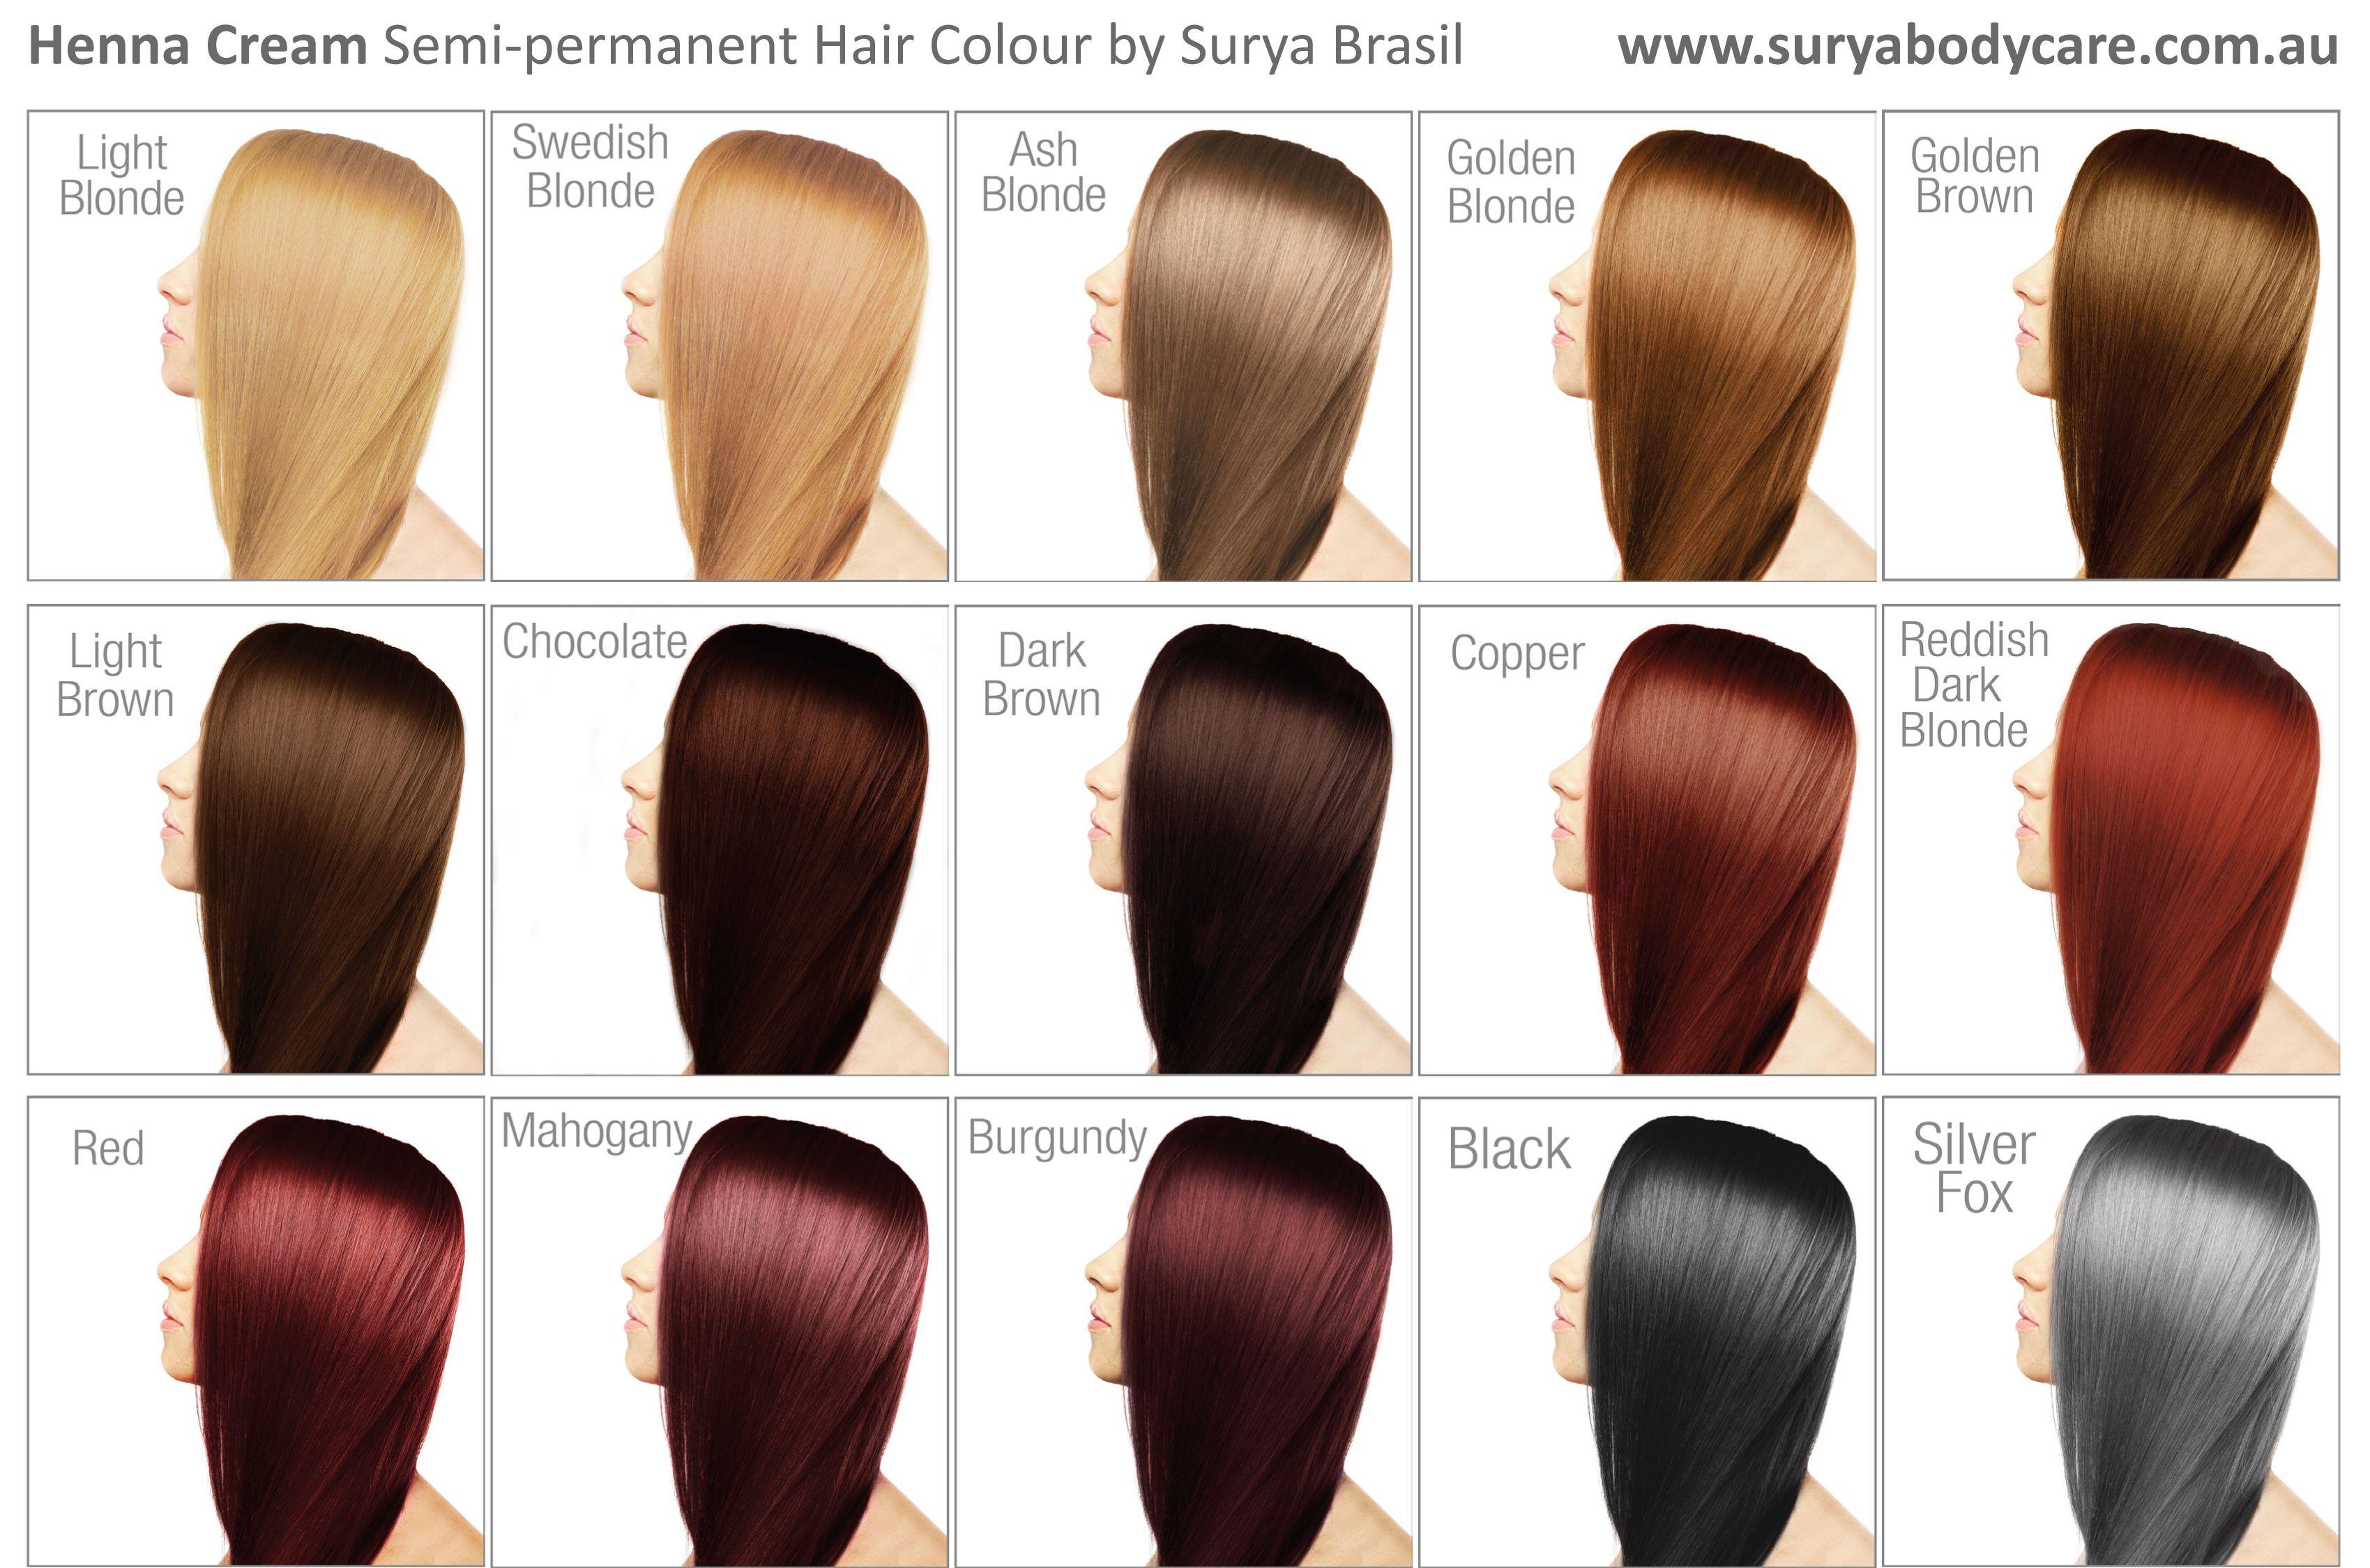 Surya Henna Cream Shade Chart Hot Head Pinterest Hair Hair